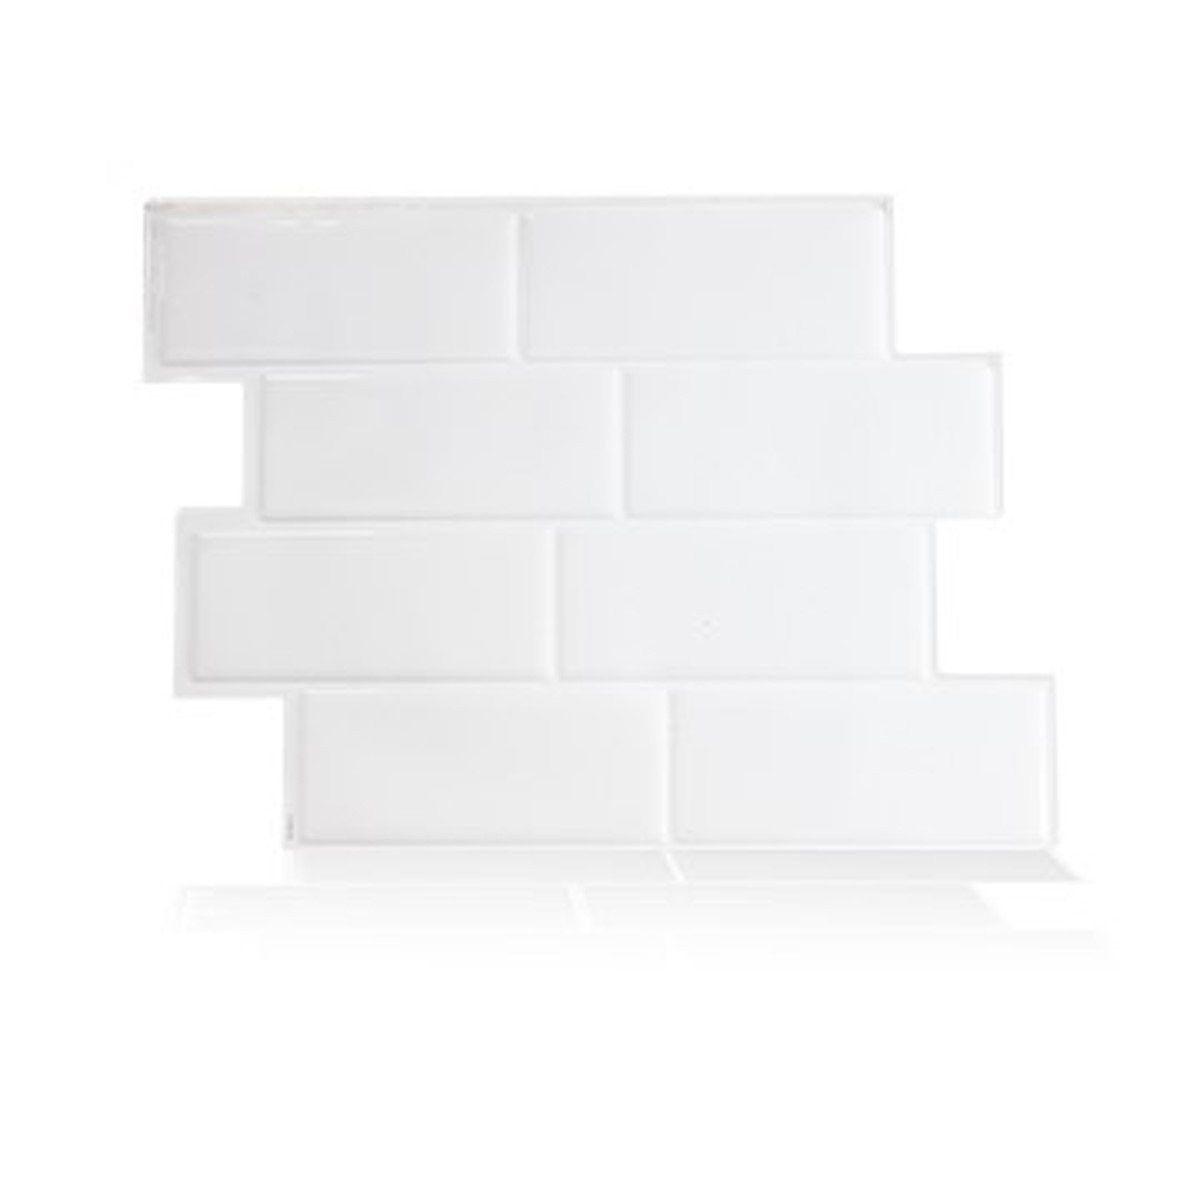 Carrelage Mural Adhesif 3d Smart Tiles Metro Blanc X6 Taille